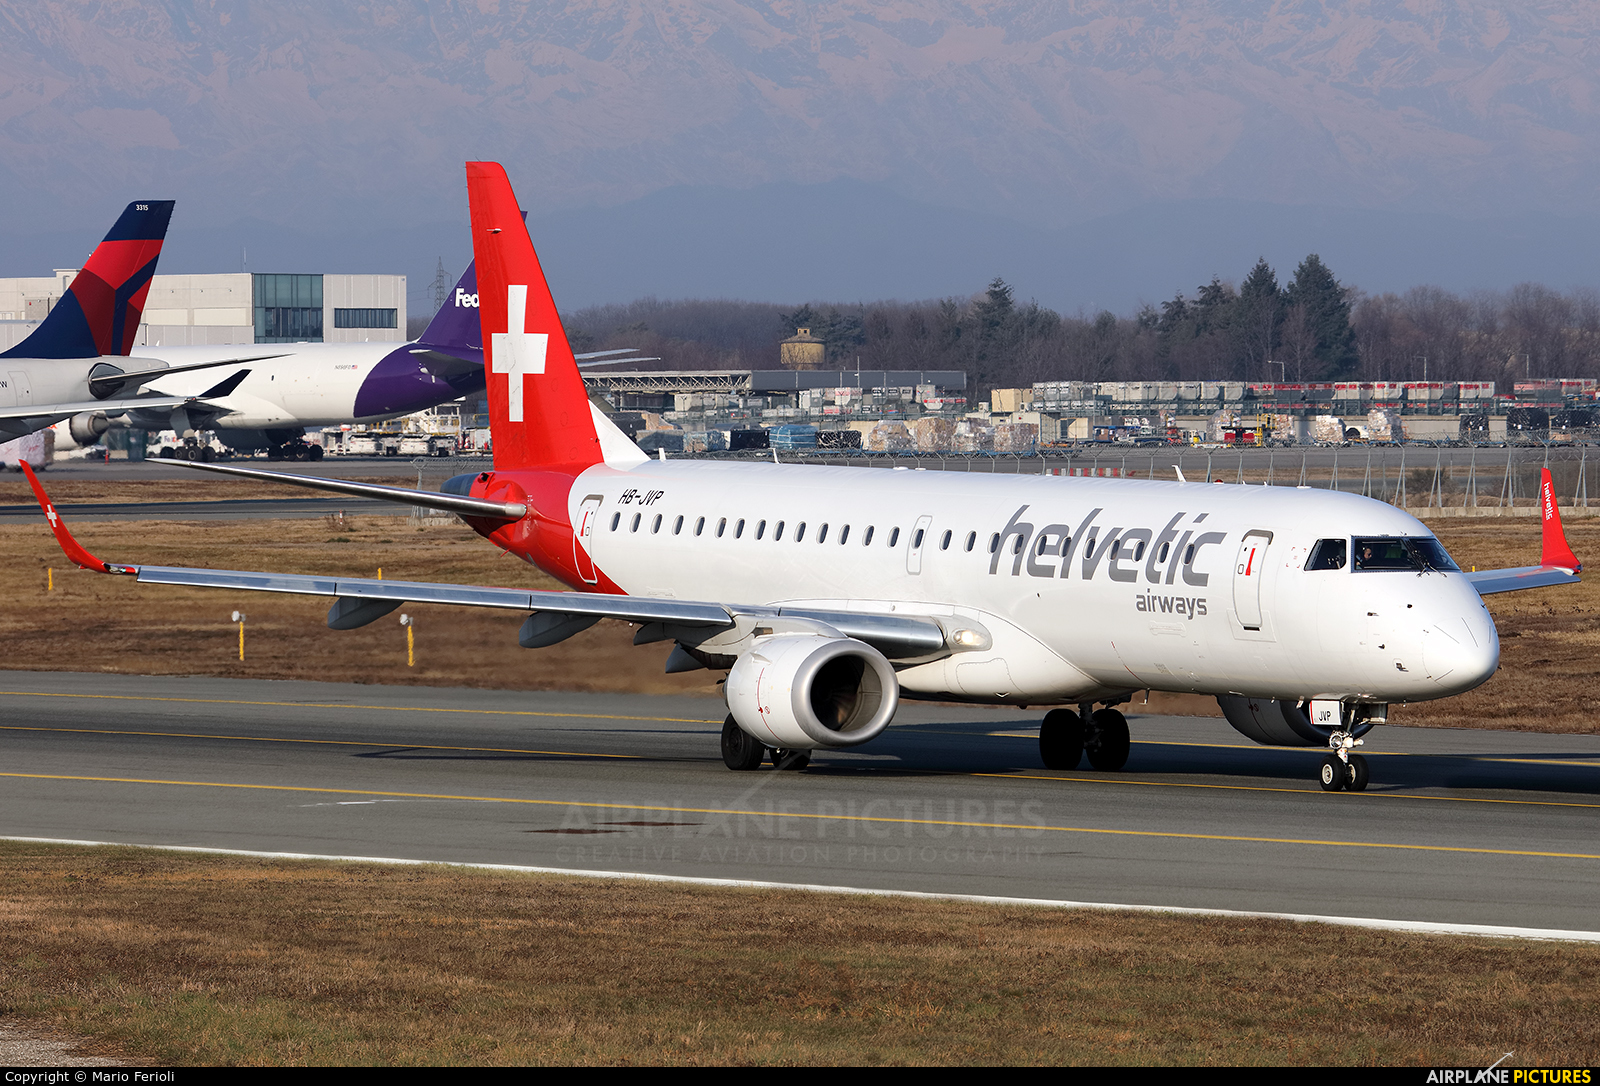 Helvetic Airways HB-JVP aircraft at Milan - Malpensa